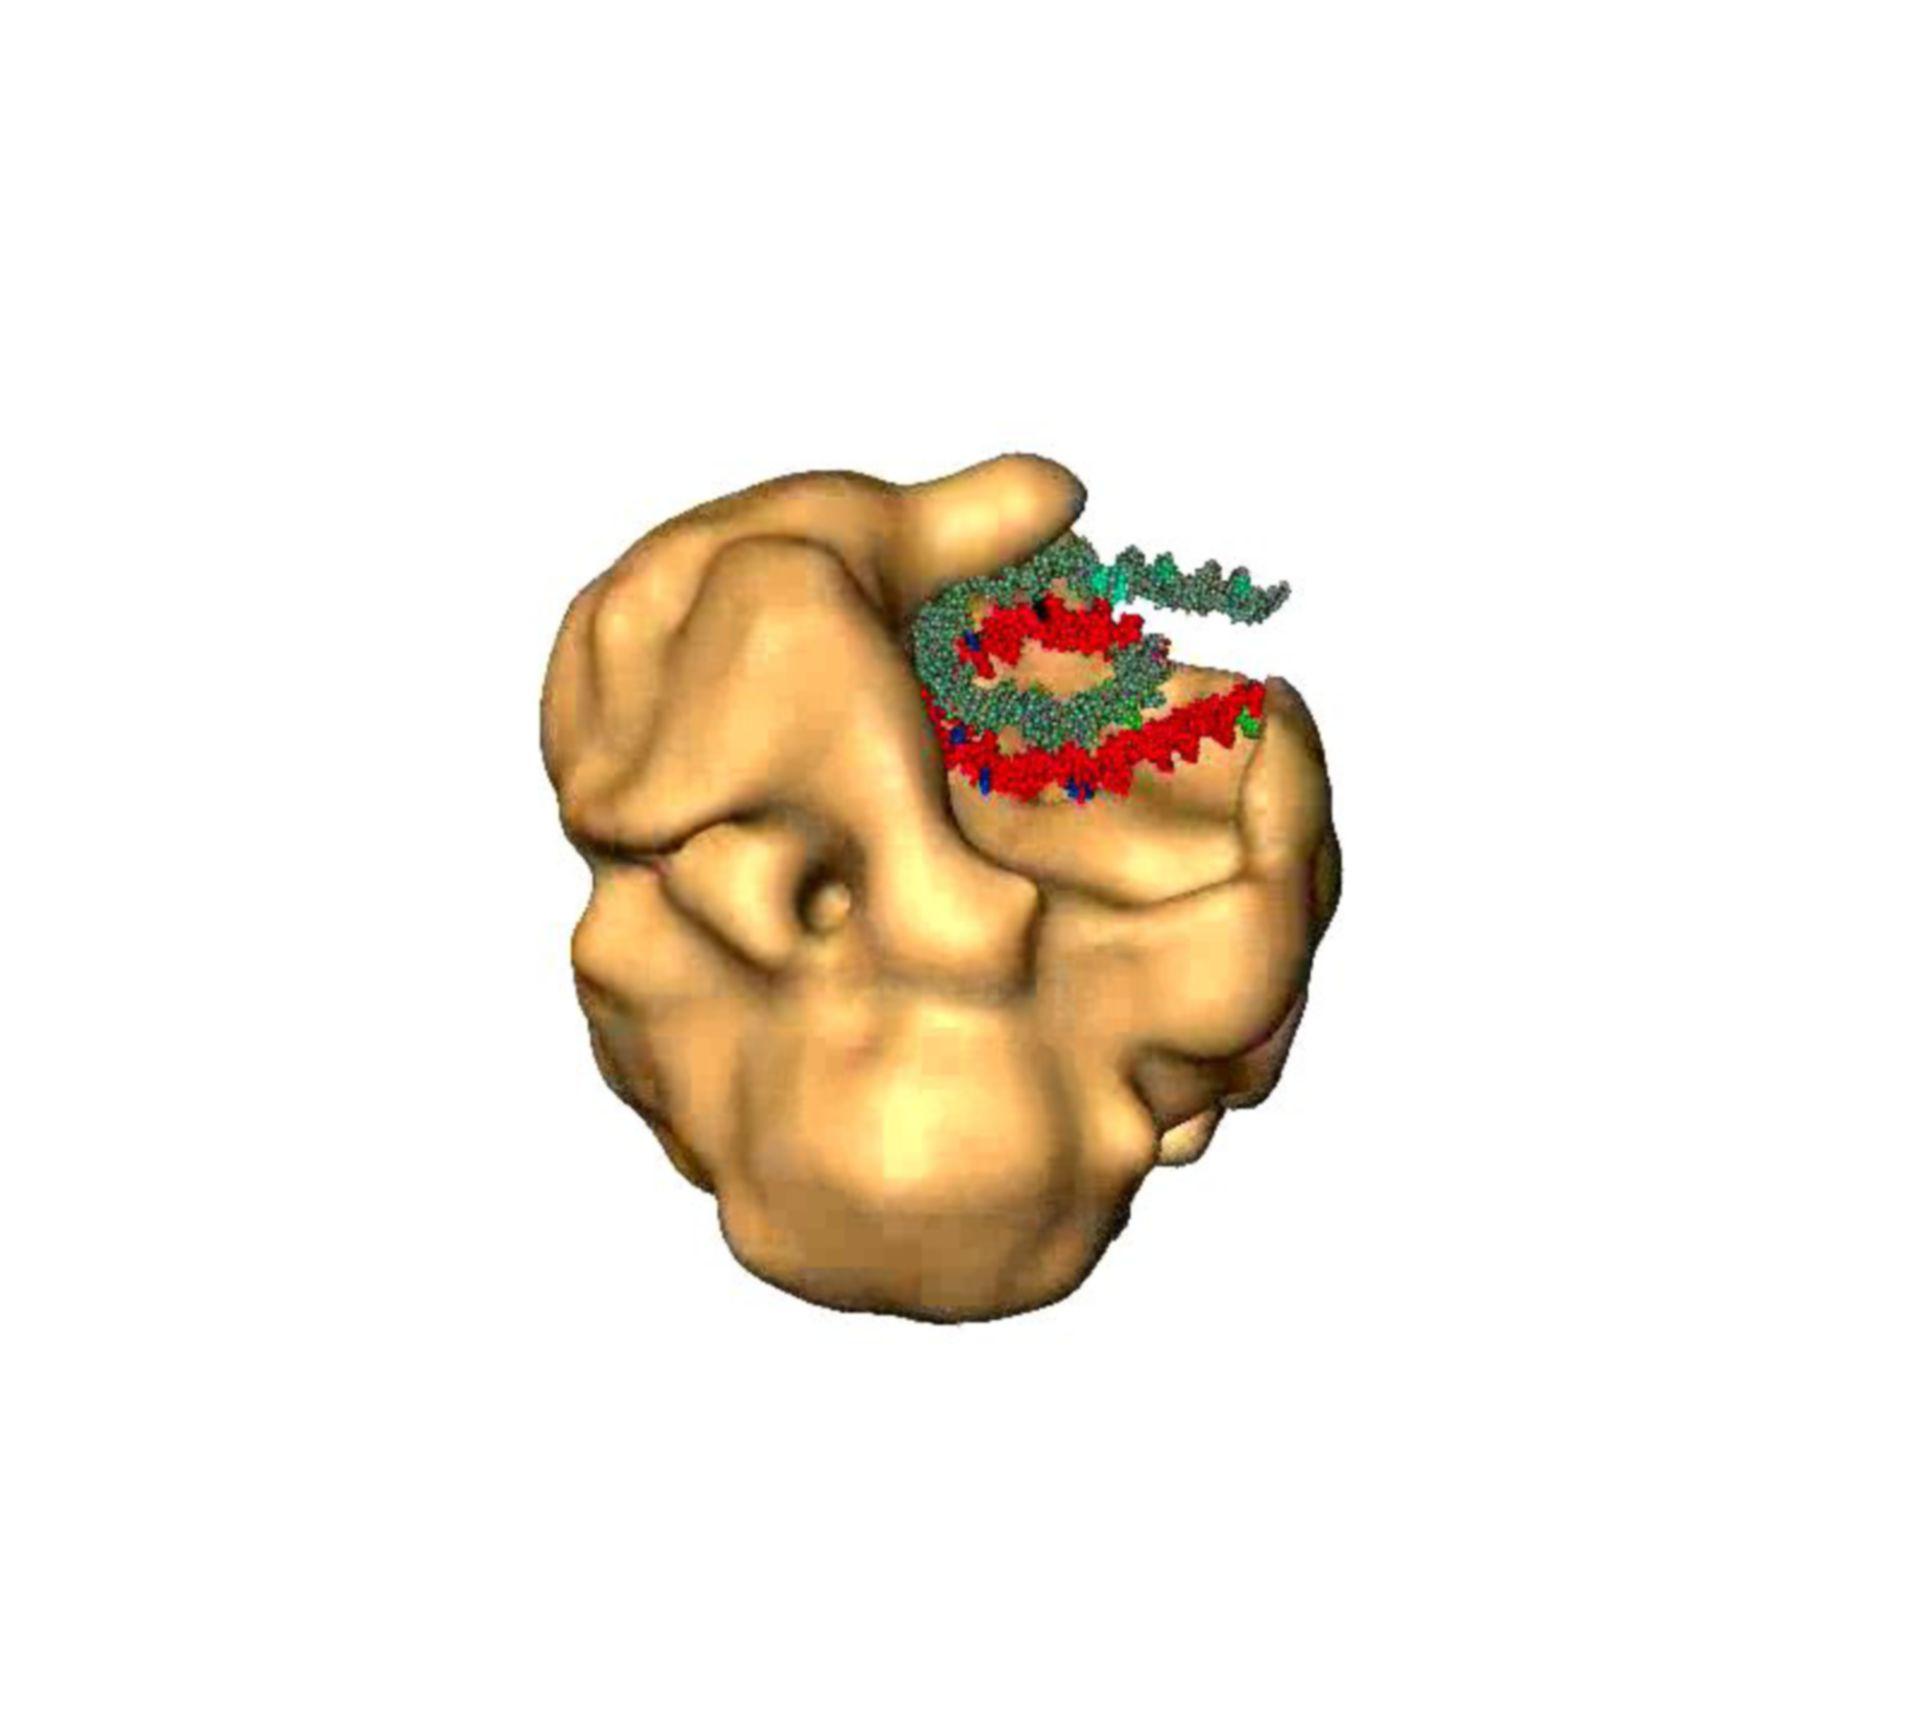 Saccharomyces cerevisiae (SWI/SNF complex) - CIL:7807